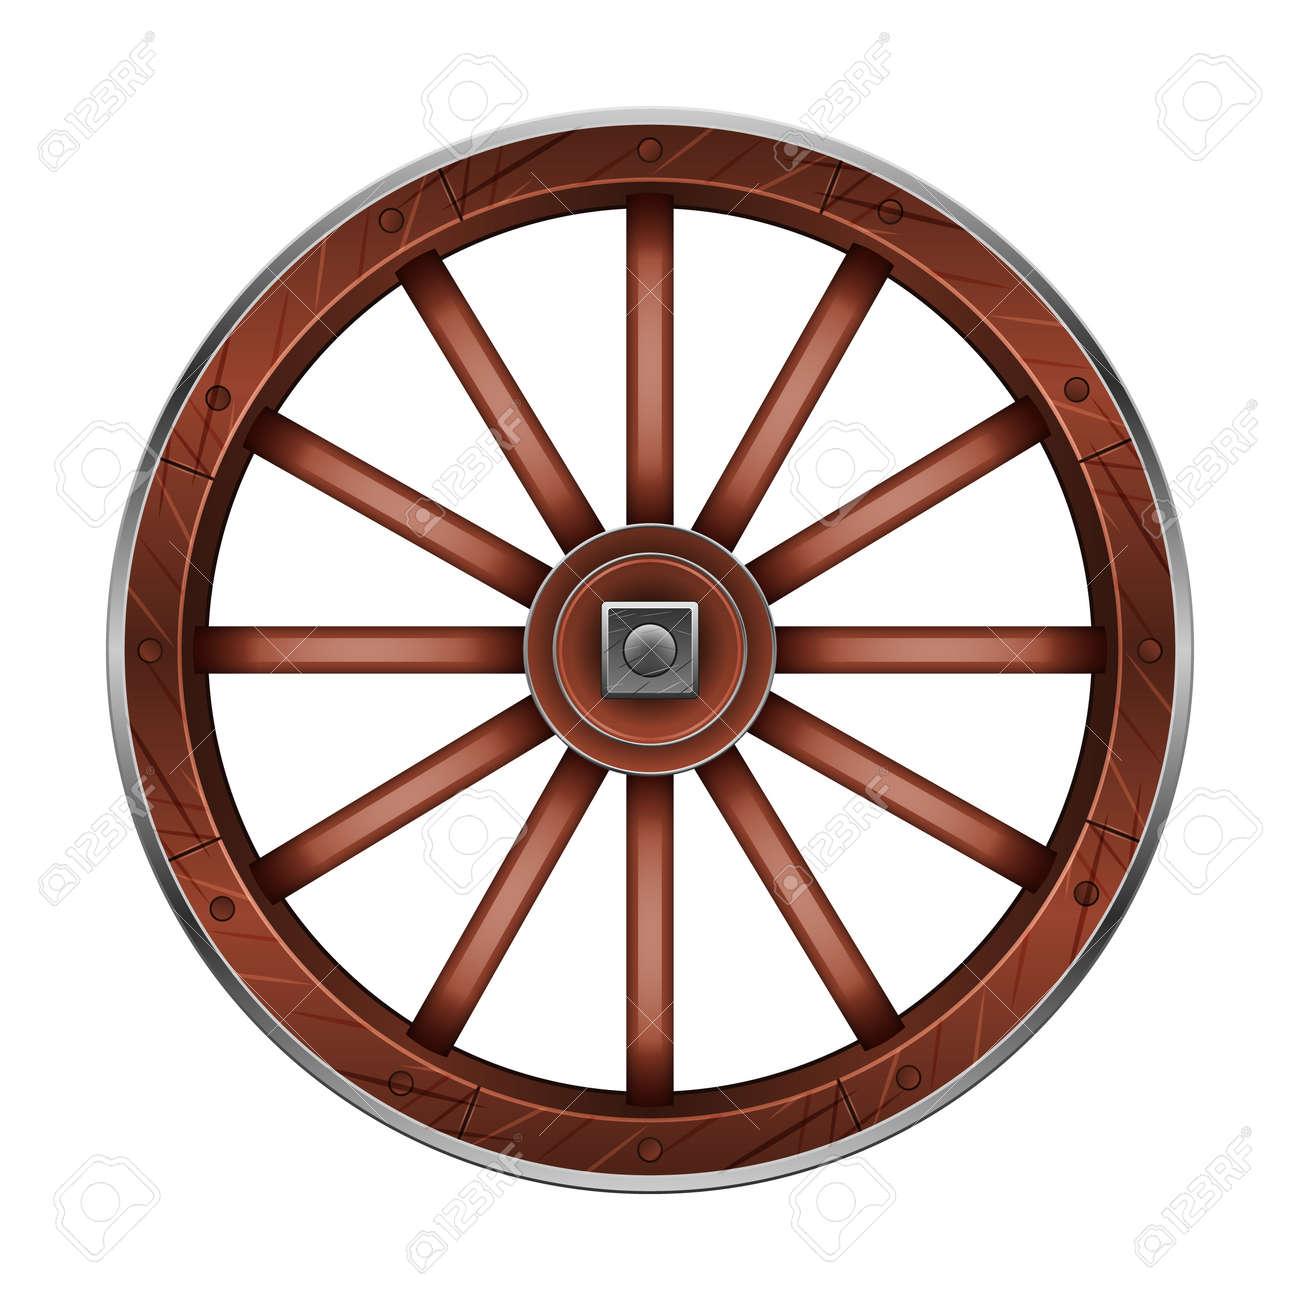 Wild west wheel vector icon.Cartoon vector icon isolated on white background wild west wheel. - 165028844